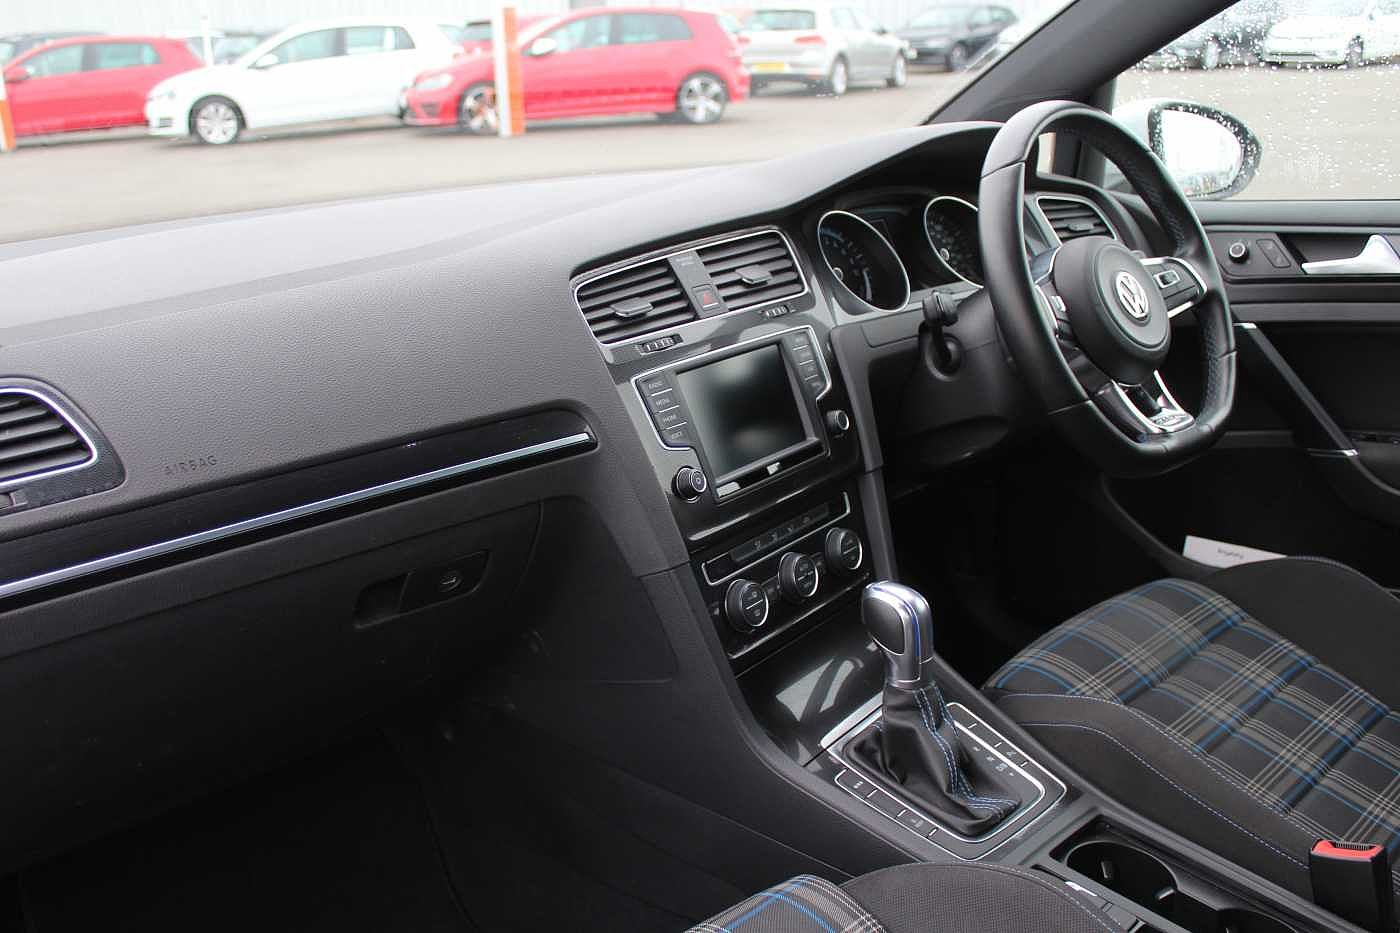 Volkswagen Golf 1.4 TSI PHEV GTE 204PS DSG Hatchback 5Dr